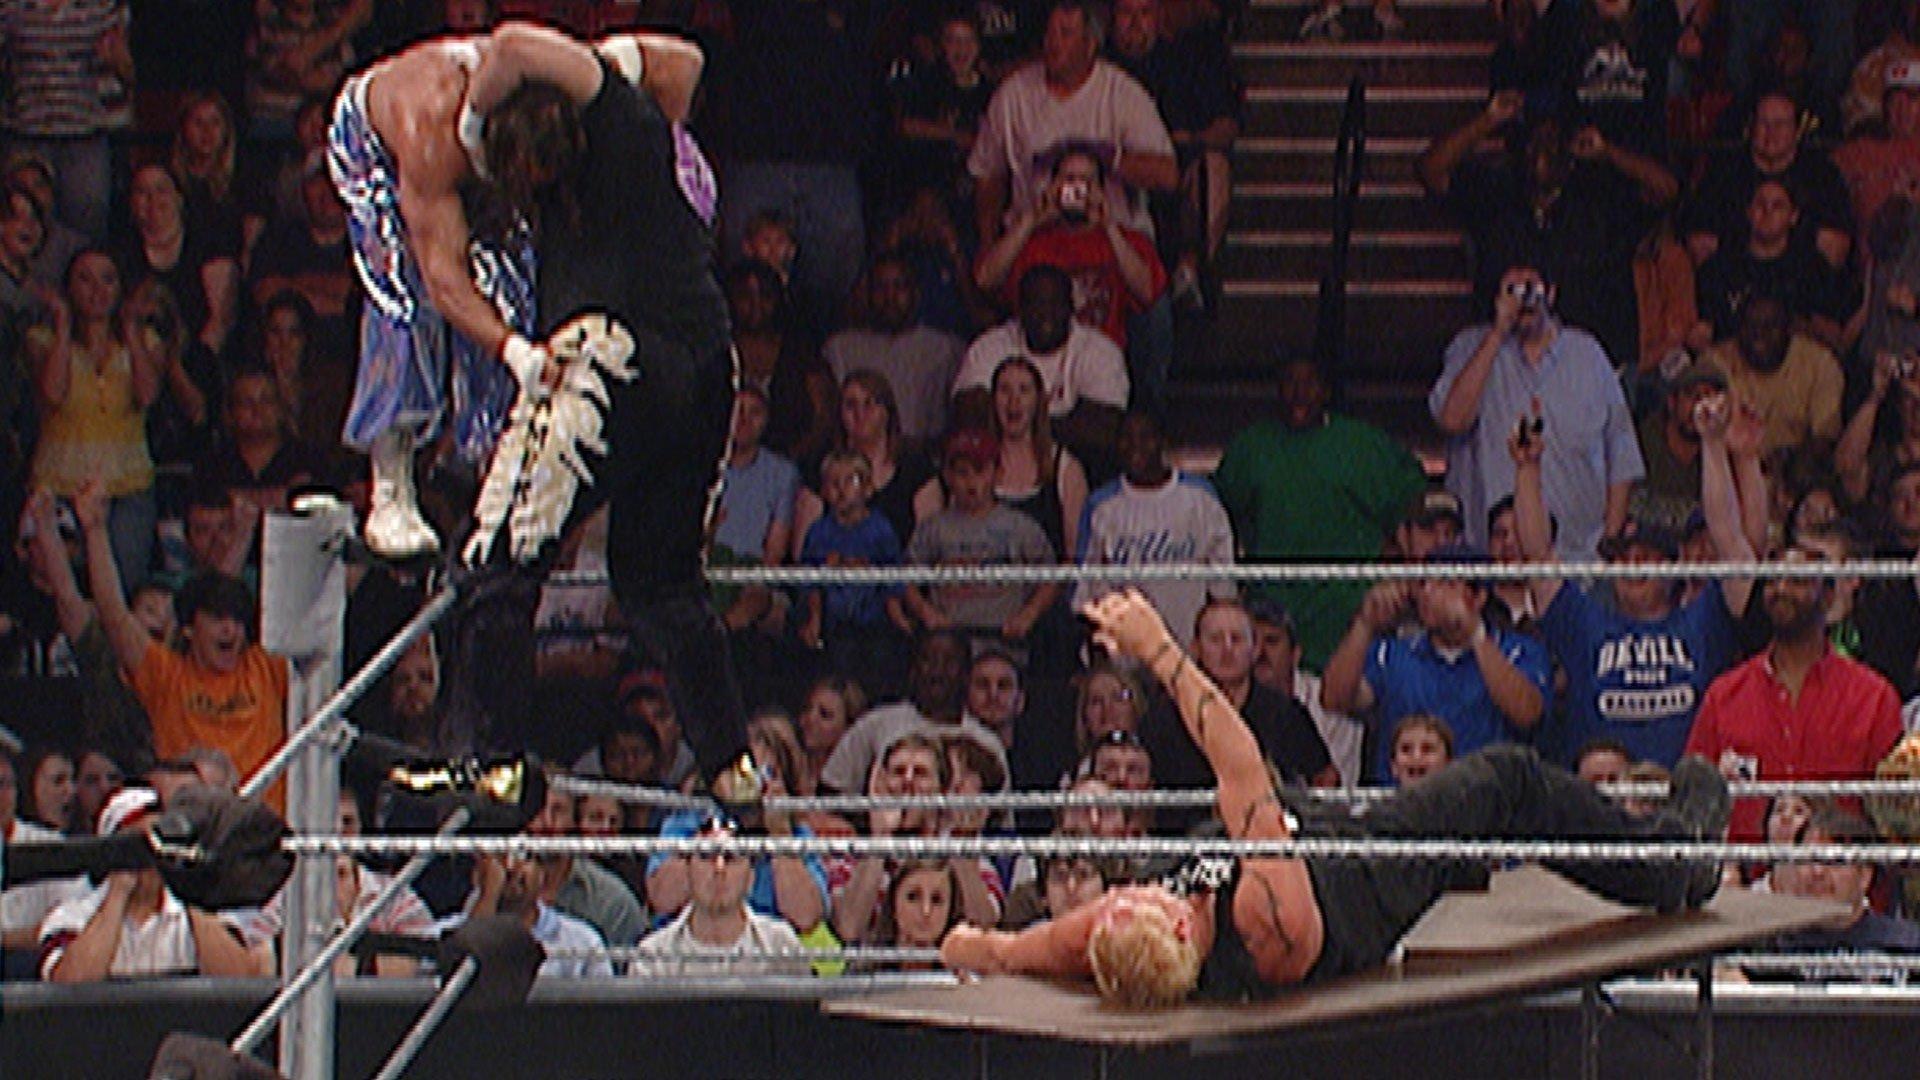 Rob Van Dam vs. Sabu vs. Tommy Dreamer vs. The Sandman - Extreme Rules Fatal 4-Way Match: ECW, 1er mai 2007 (WWE Network Exclusive)